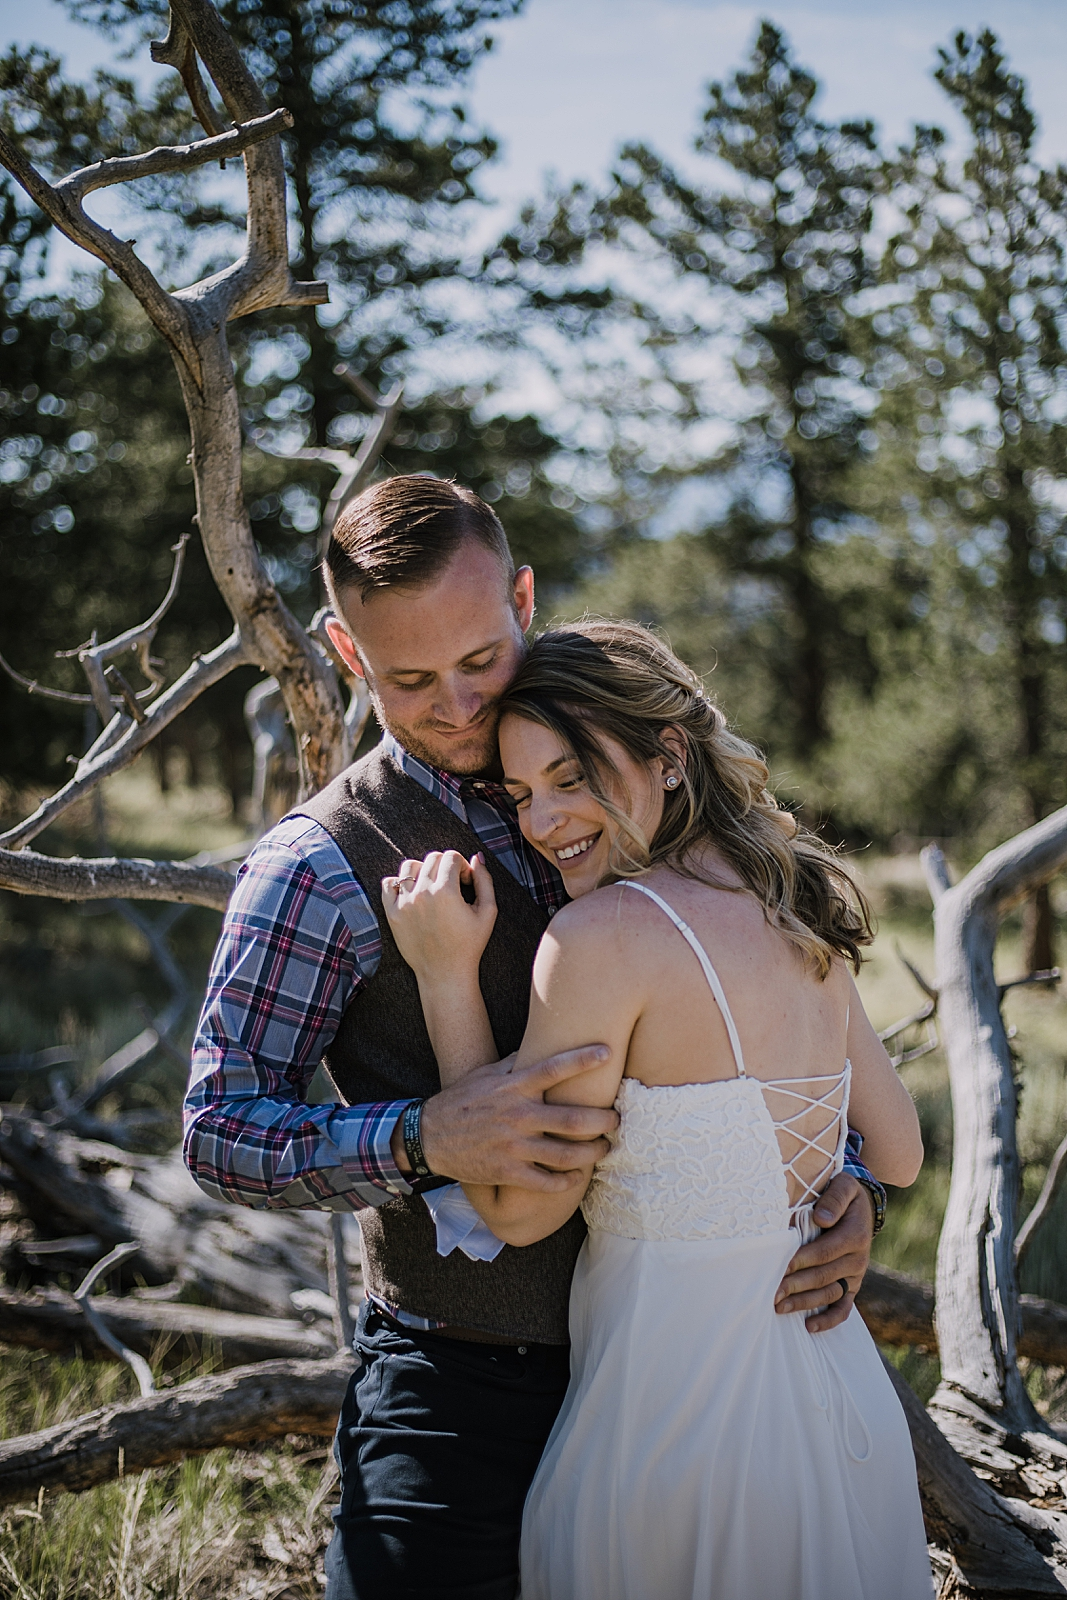 couple cuddling, RMNP elopement ceremony, rocky mountain national park elopement, 3M curves elopement, self solemnizing, self solemnization, long's peak, summer hiking elopement, estes park elopement